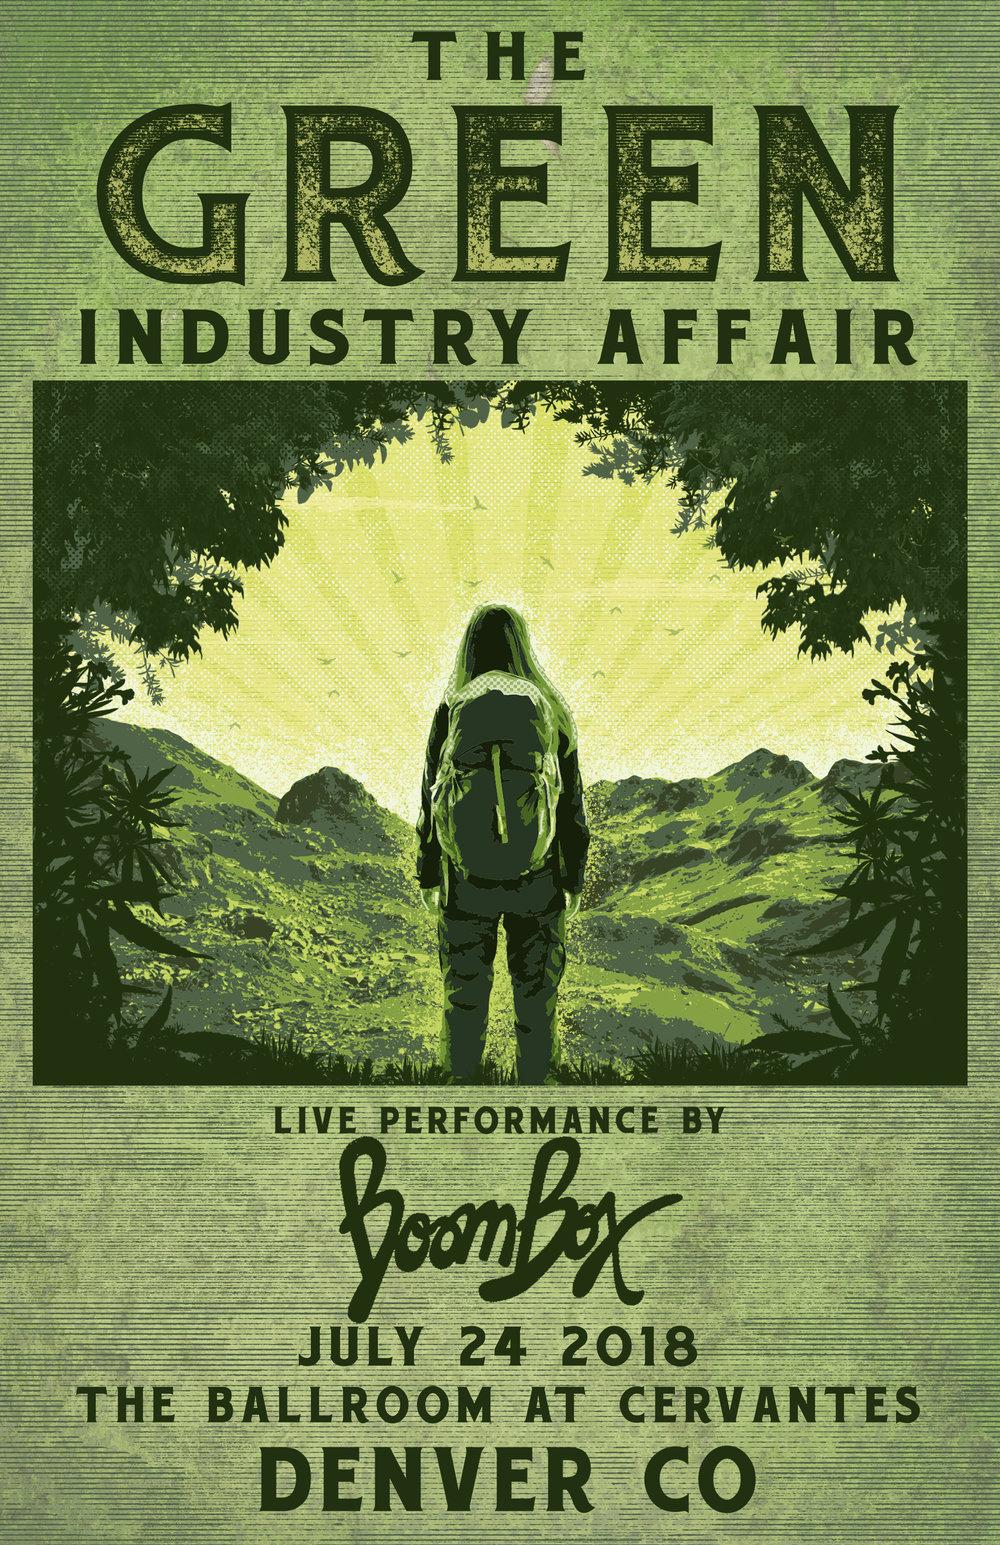 Green Industry Affair 11x17 (1).jpg